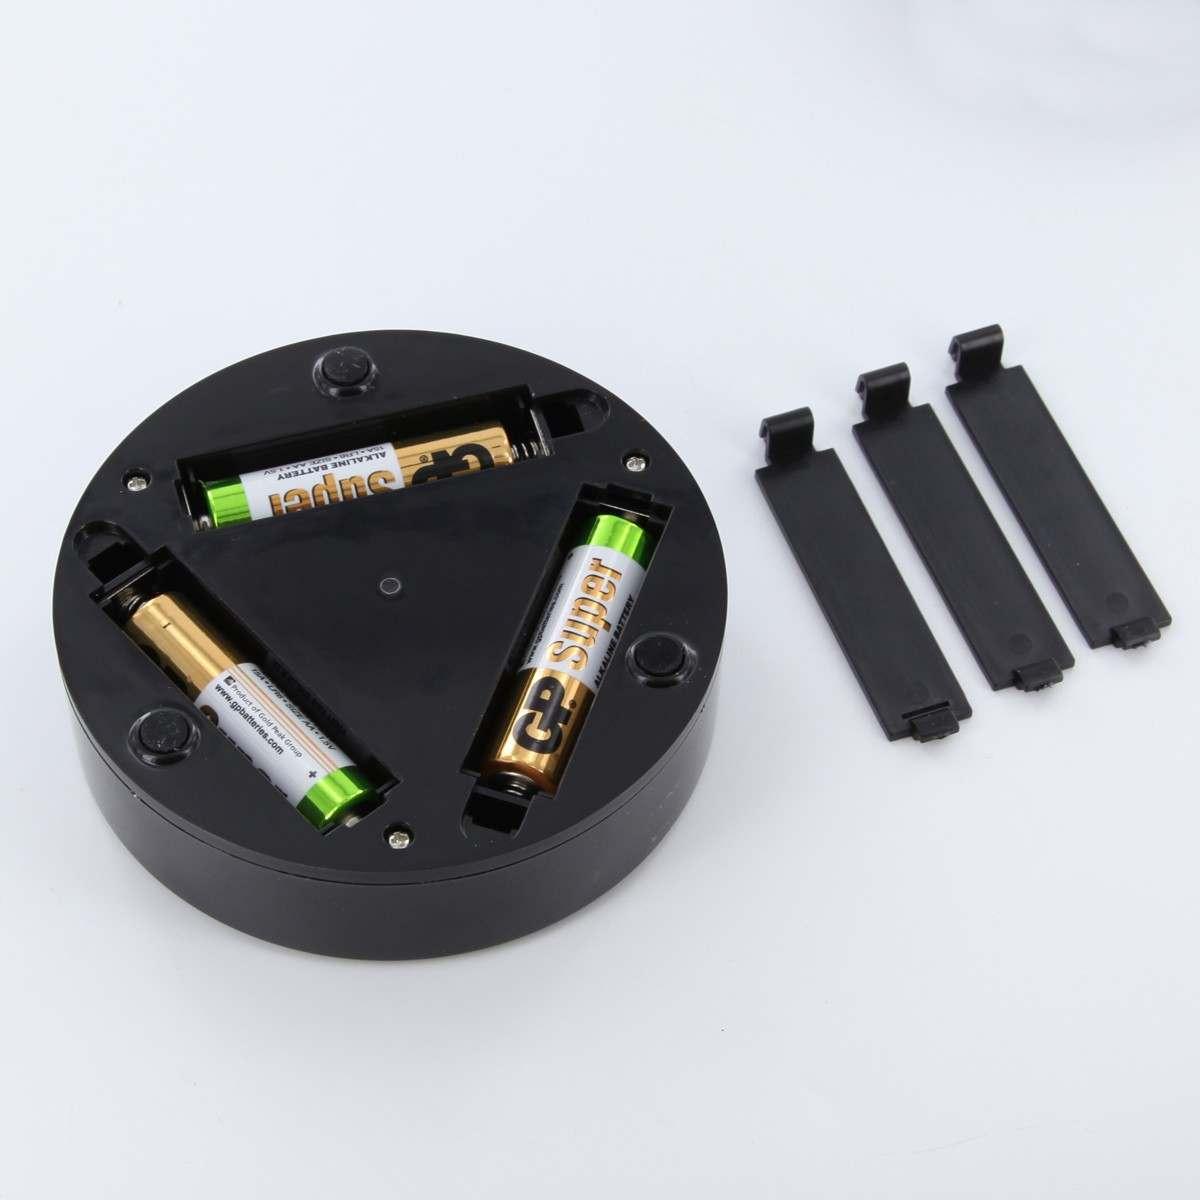 4 LED E Luminator, 9xWhite led, 3xAA (not inc), black ABS body,EVA mat, 10cmx2.5cm